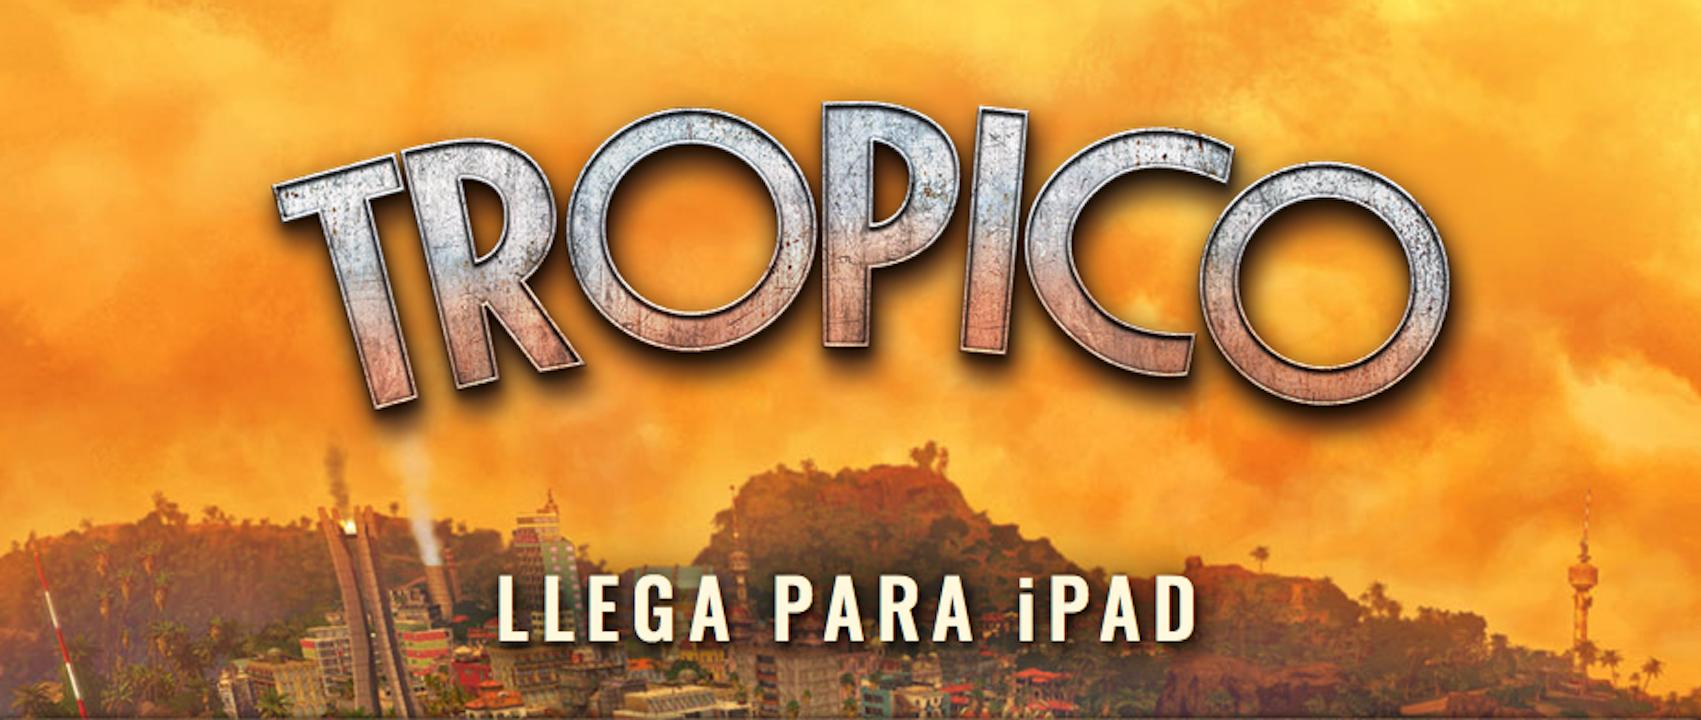 Tropico iPad